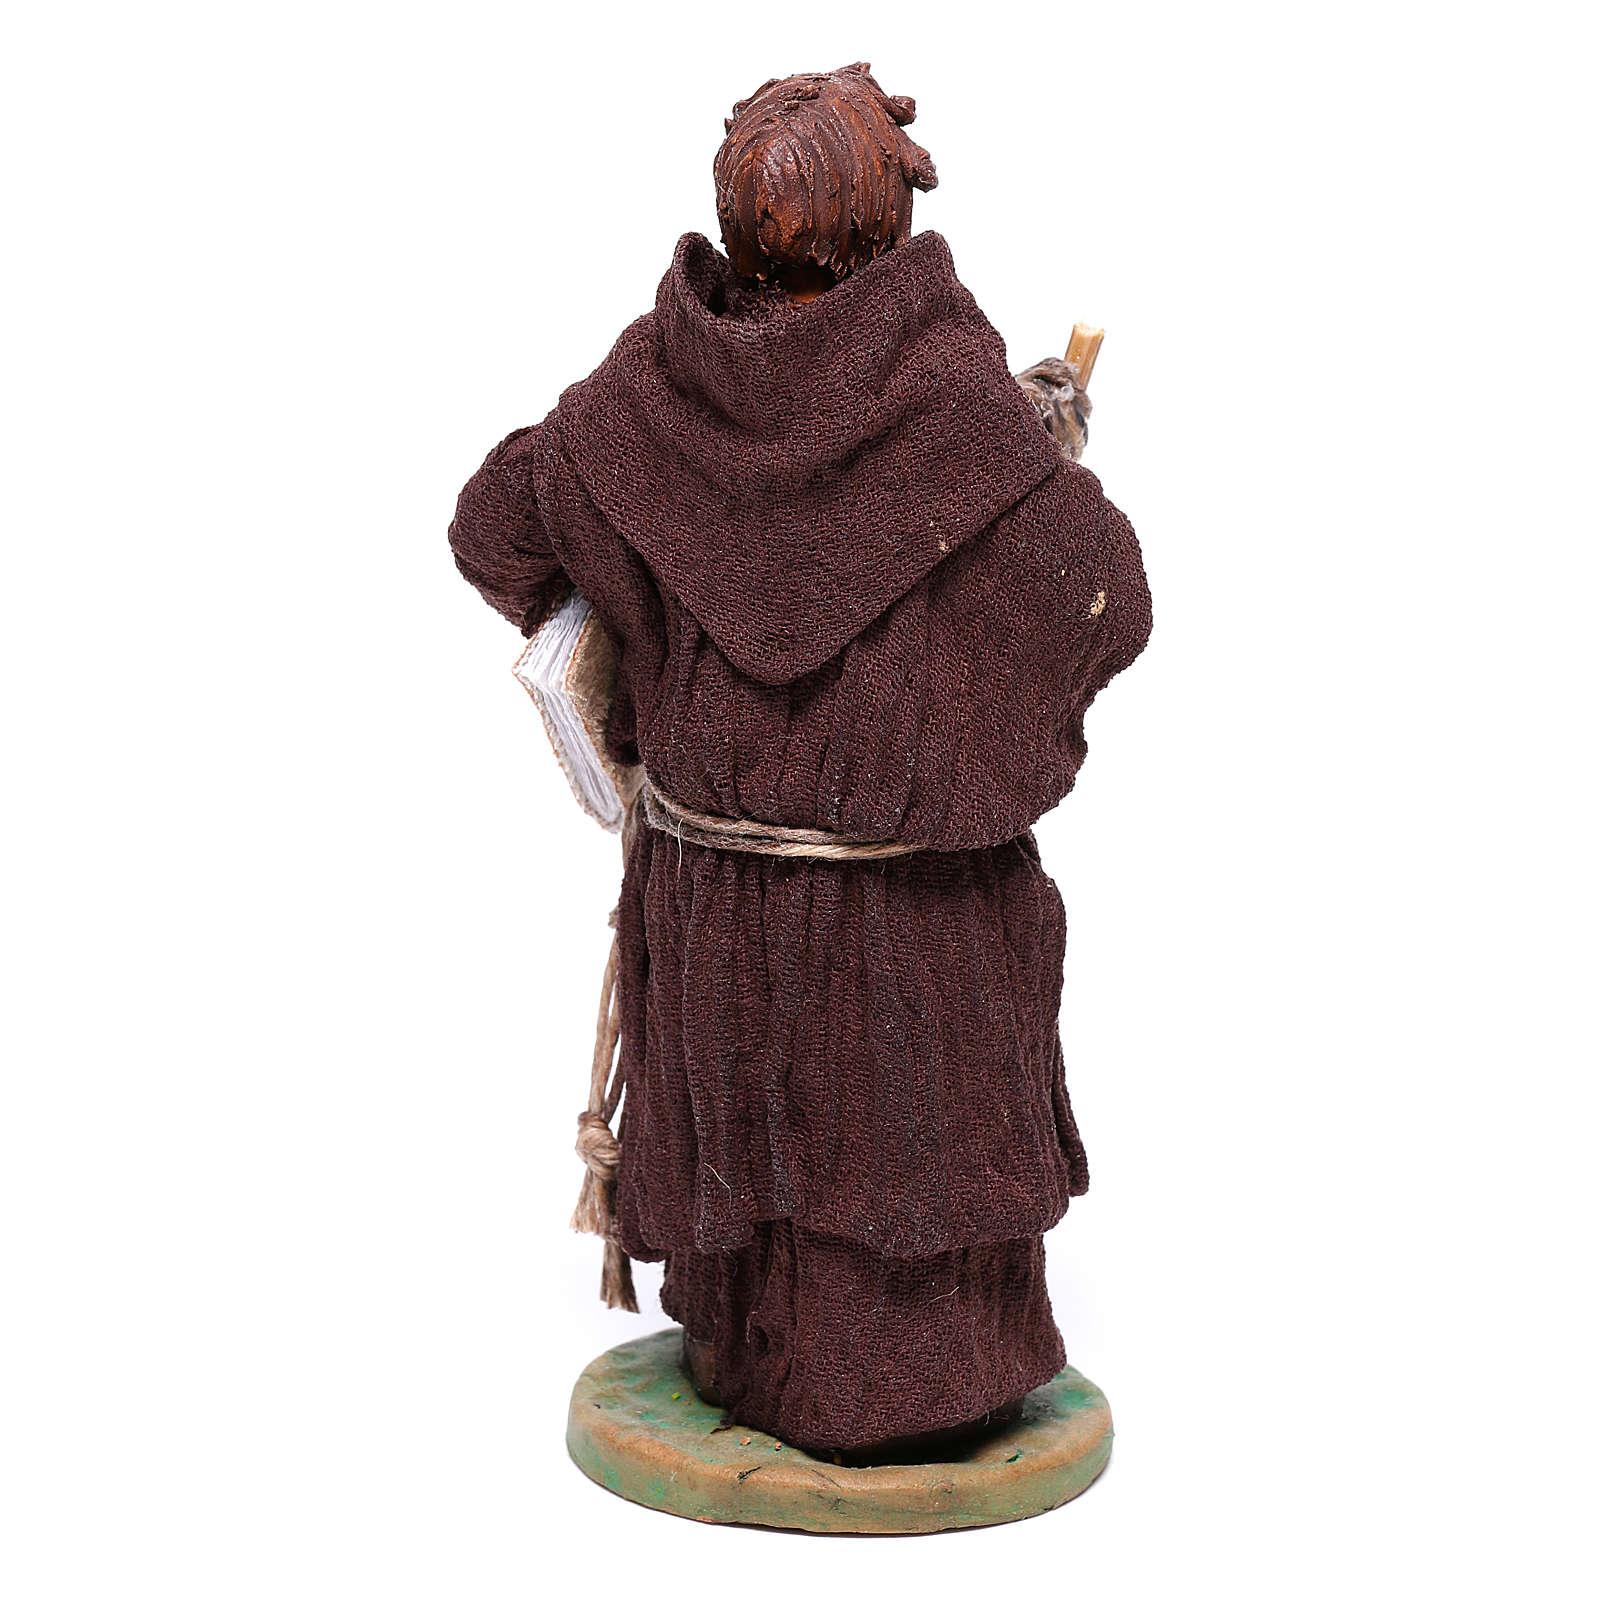 Frair statue 12 cm for Neapolitan nativity scene 4